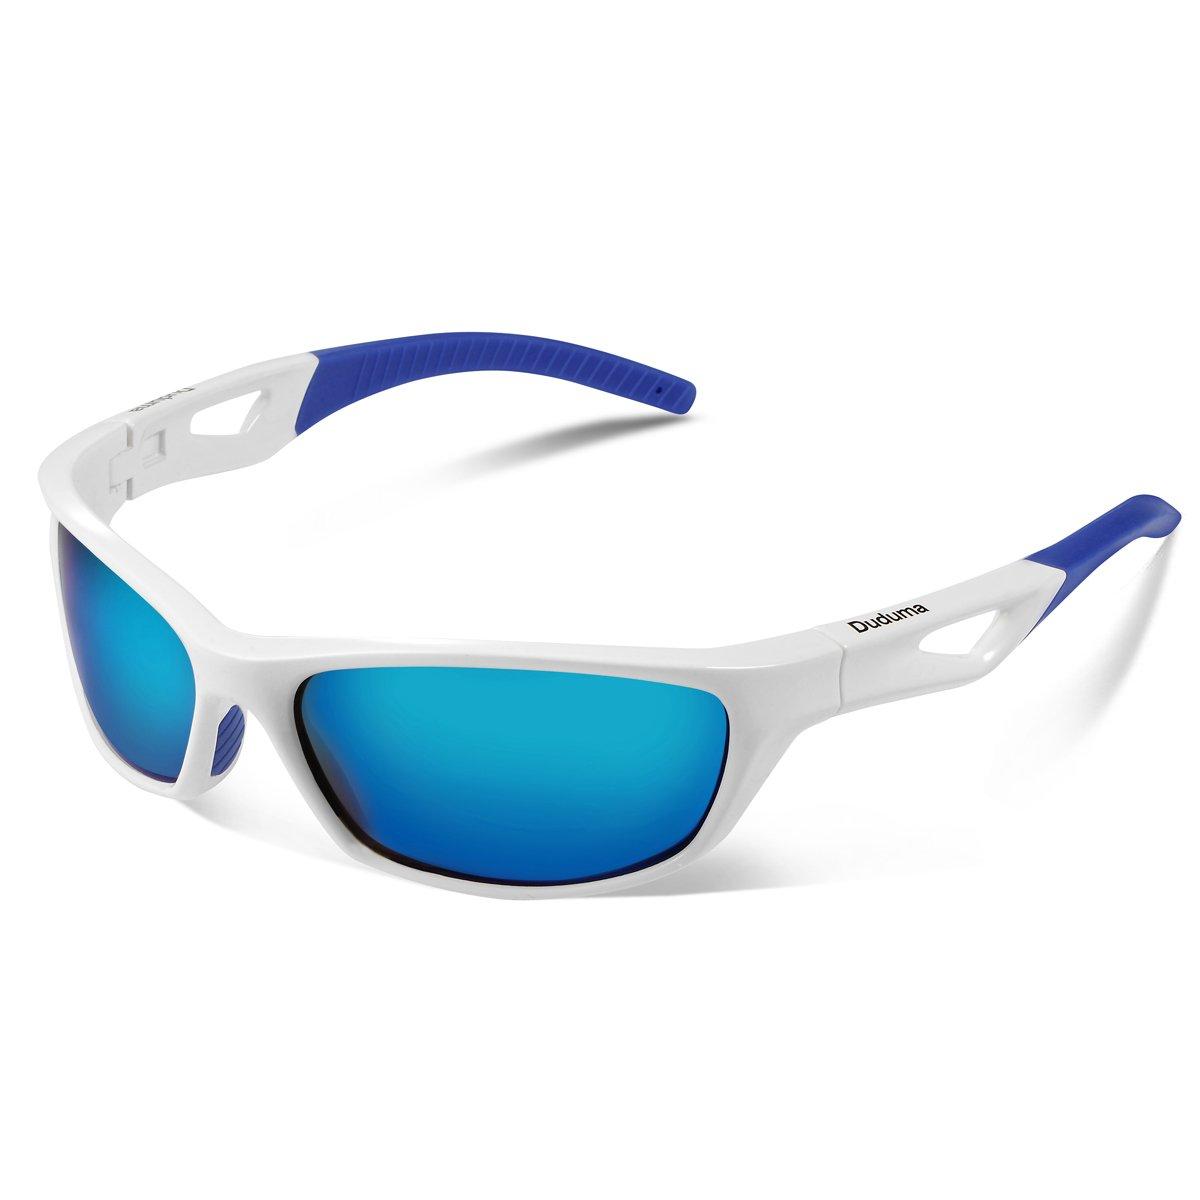 Duduma Polarized Sports Sunglasses for Mens Womens Baseball Fishing Golf Running Cycling Driving Softball Hiking Unbreakable Shades Tr80821